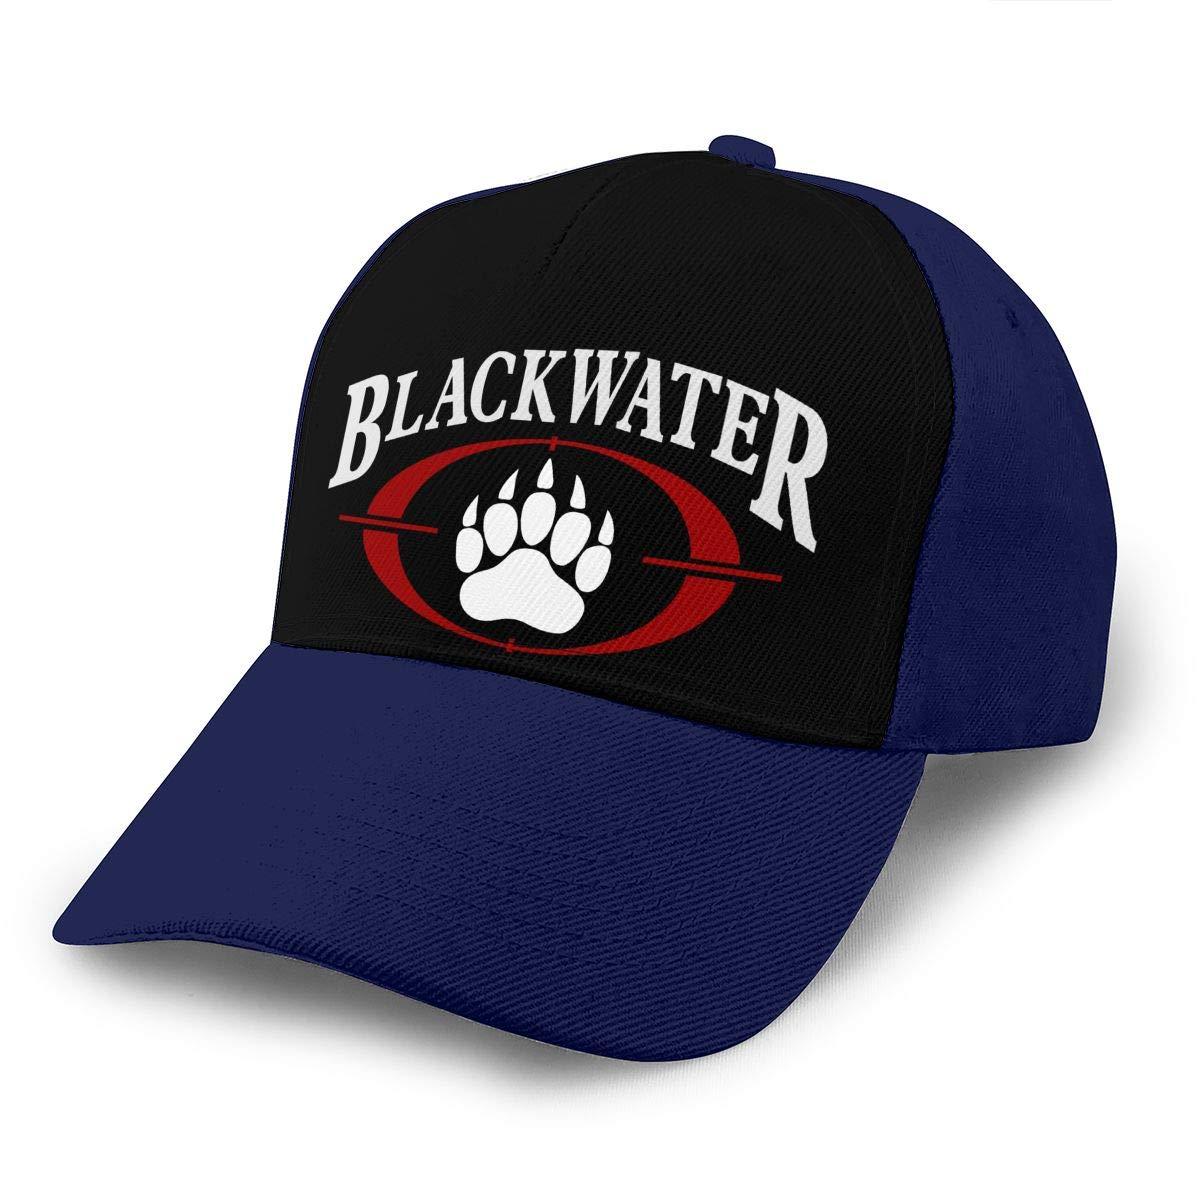 Adjustable Women Men Blackwater-Logo Print Baseball Cap Flat Brim Cap Hats Hip Hop Snapback Sun Hat Boys Girls Navy by Apolonia